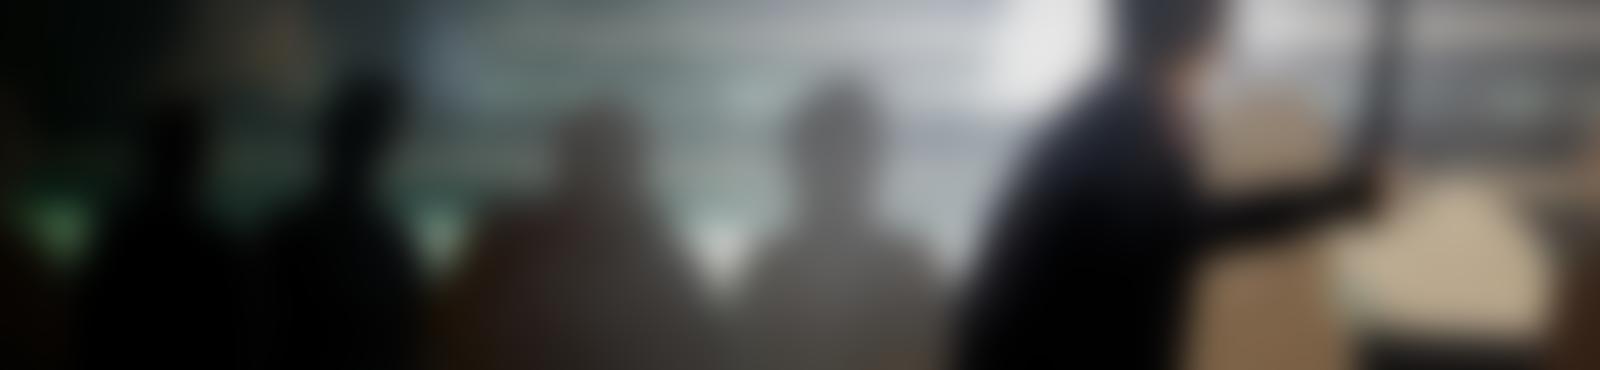 Blurred 3d4109f3 2a7d 4497 9f8a fae0d05c46d6